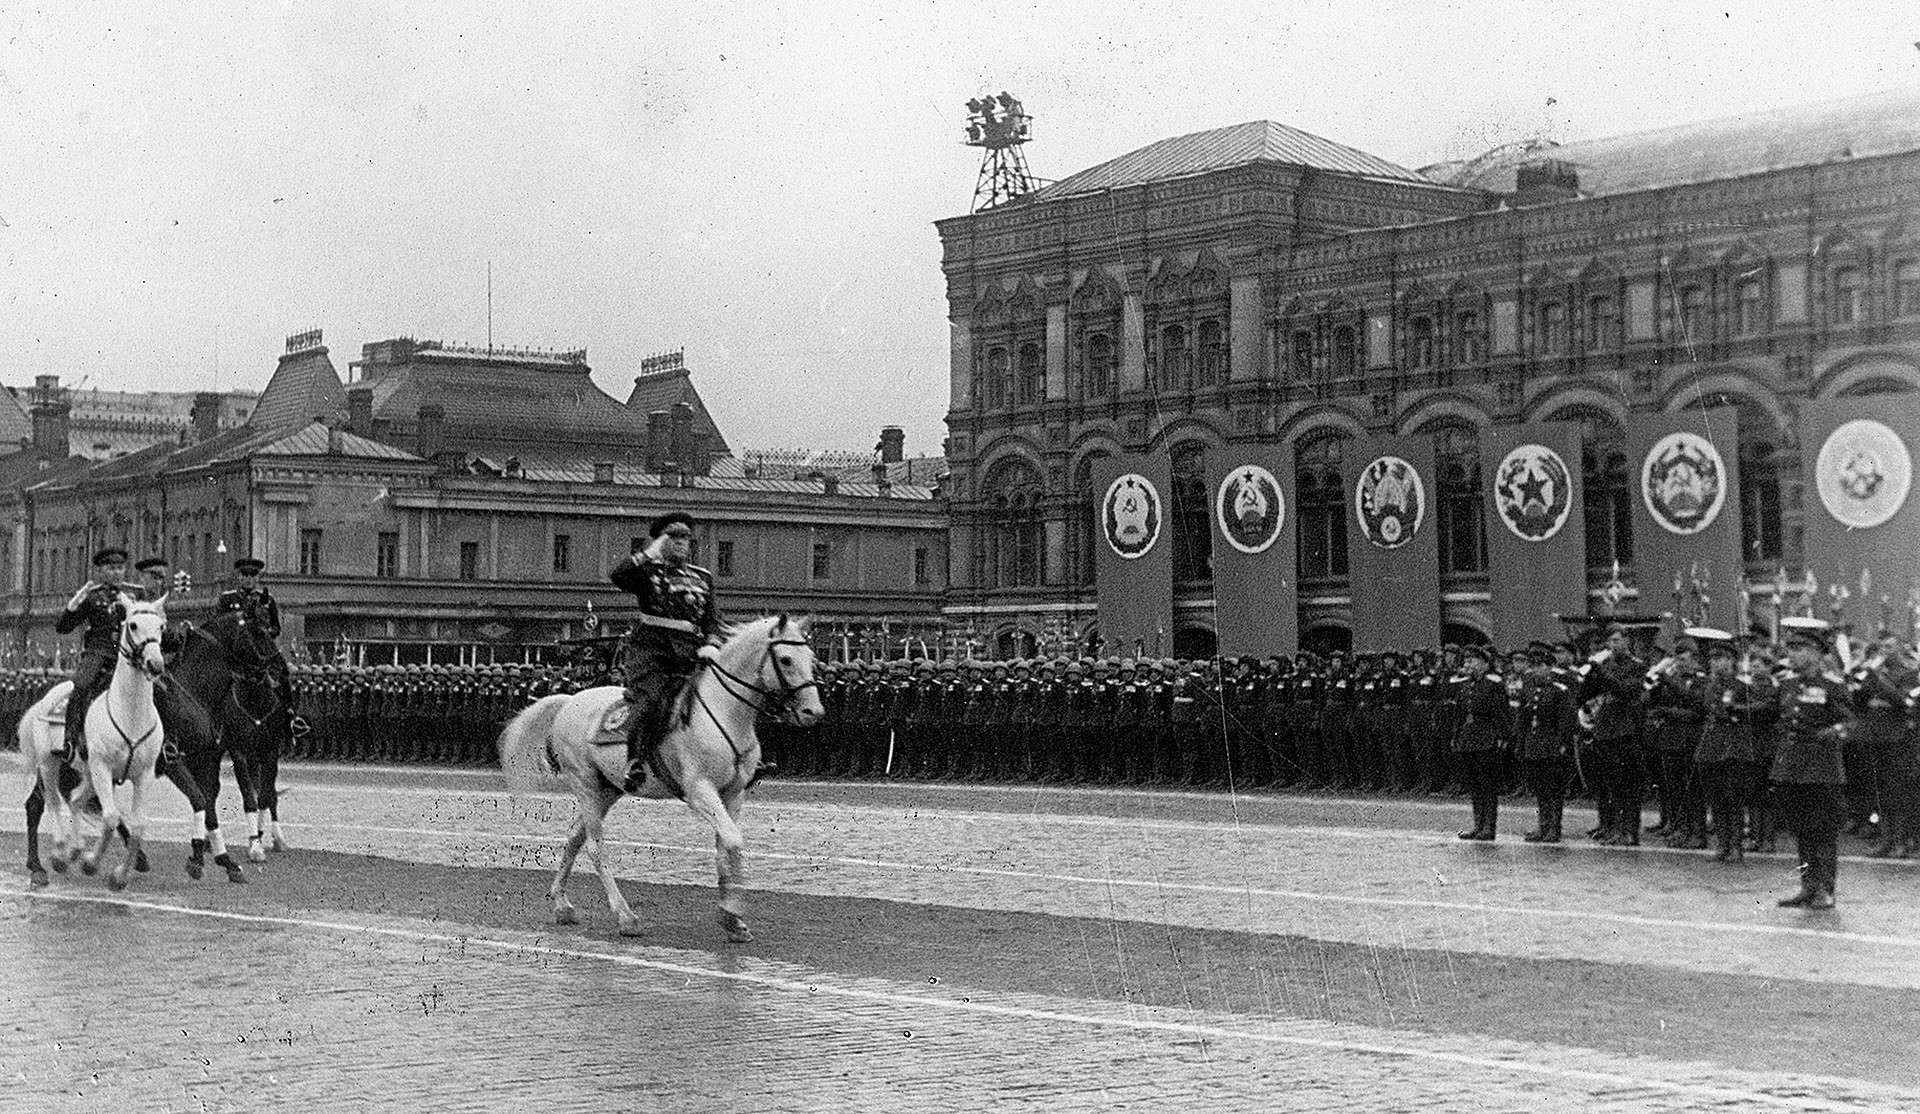 Jukov cavalgou no lugar de Stálin.